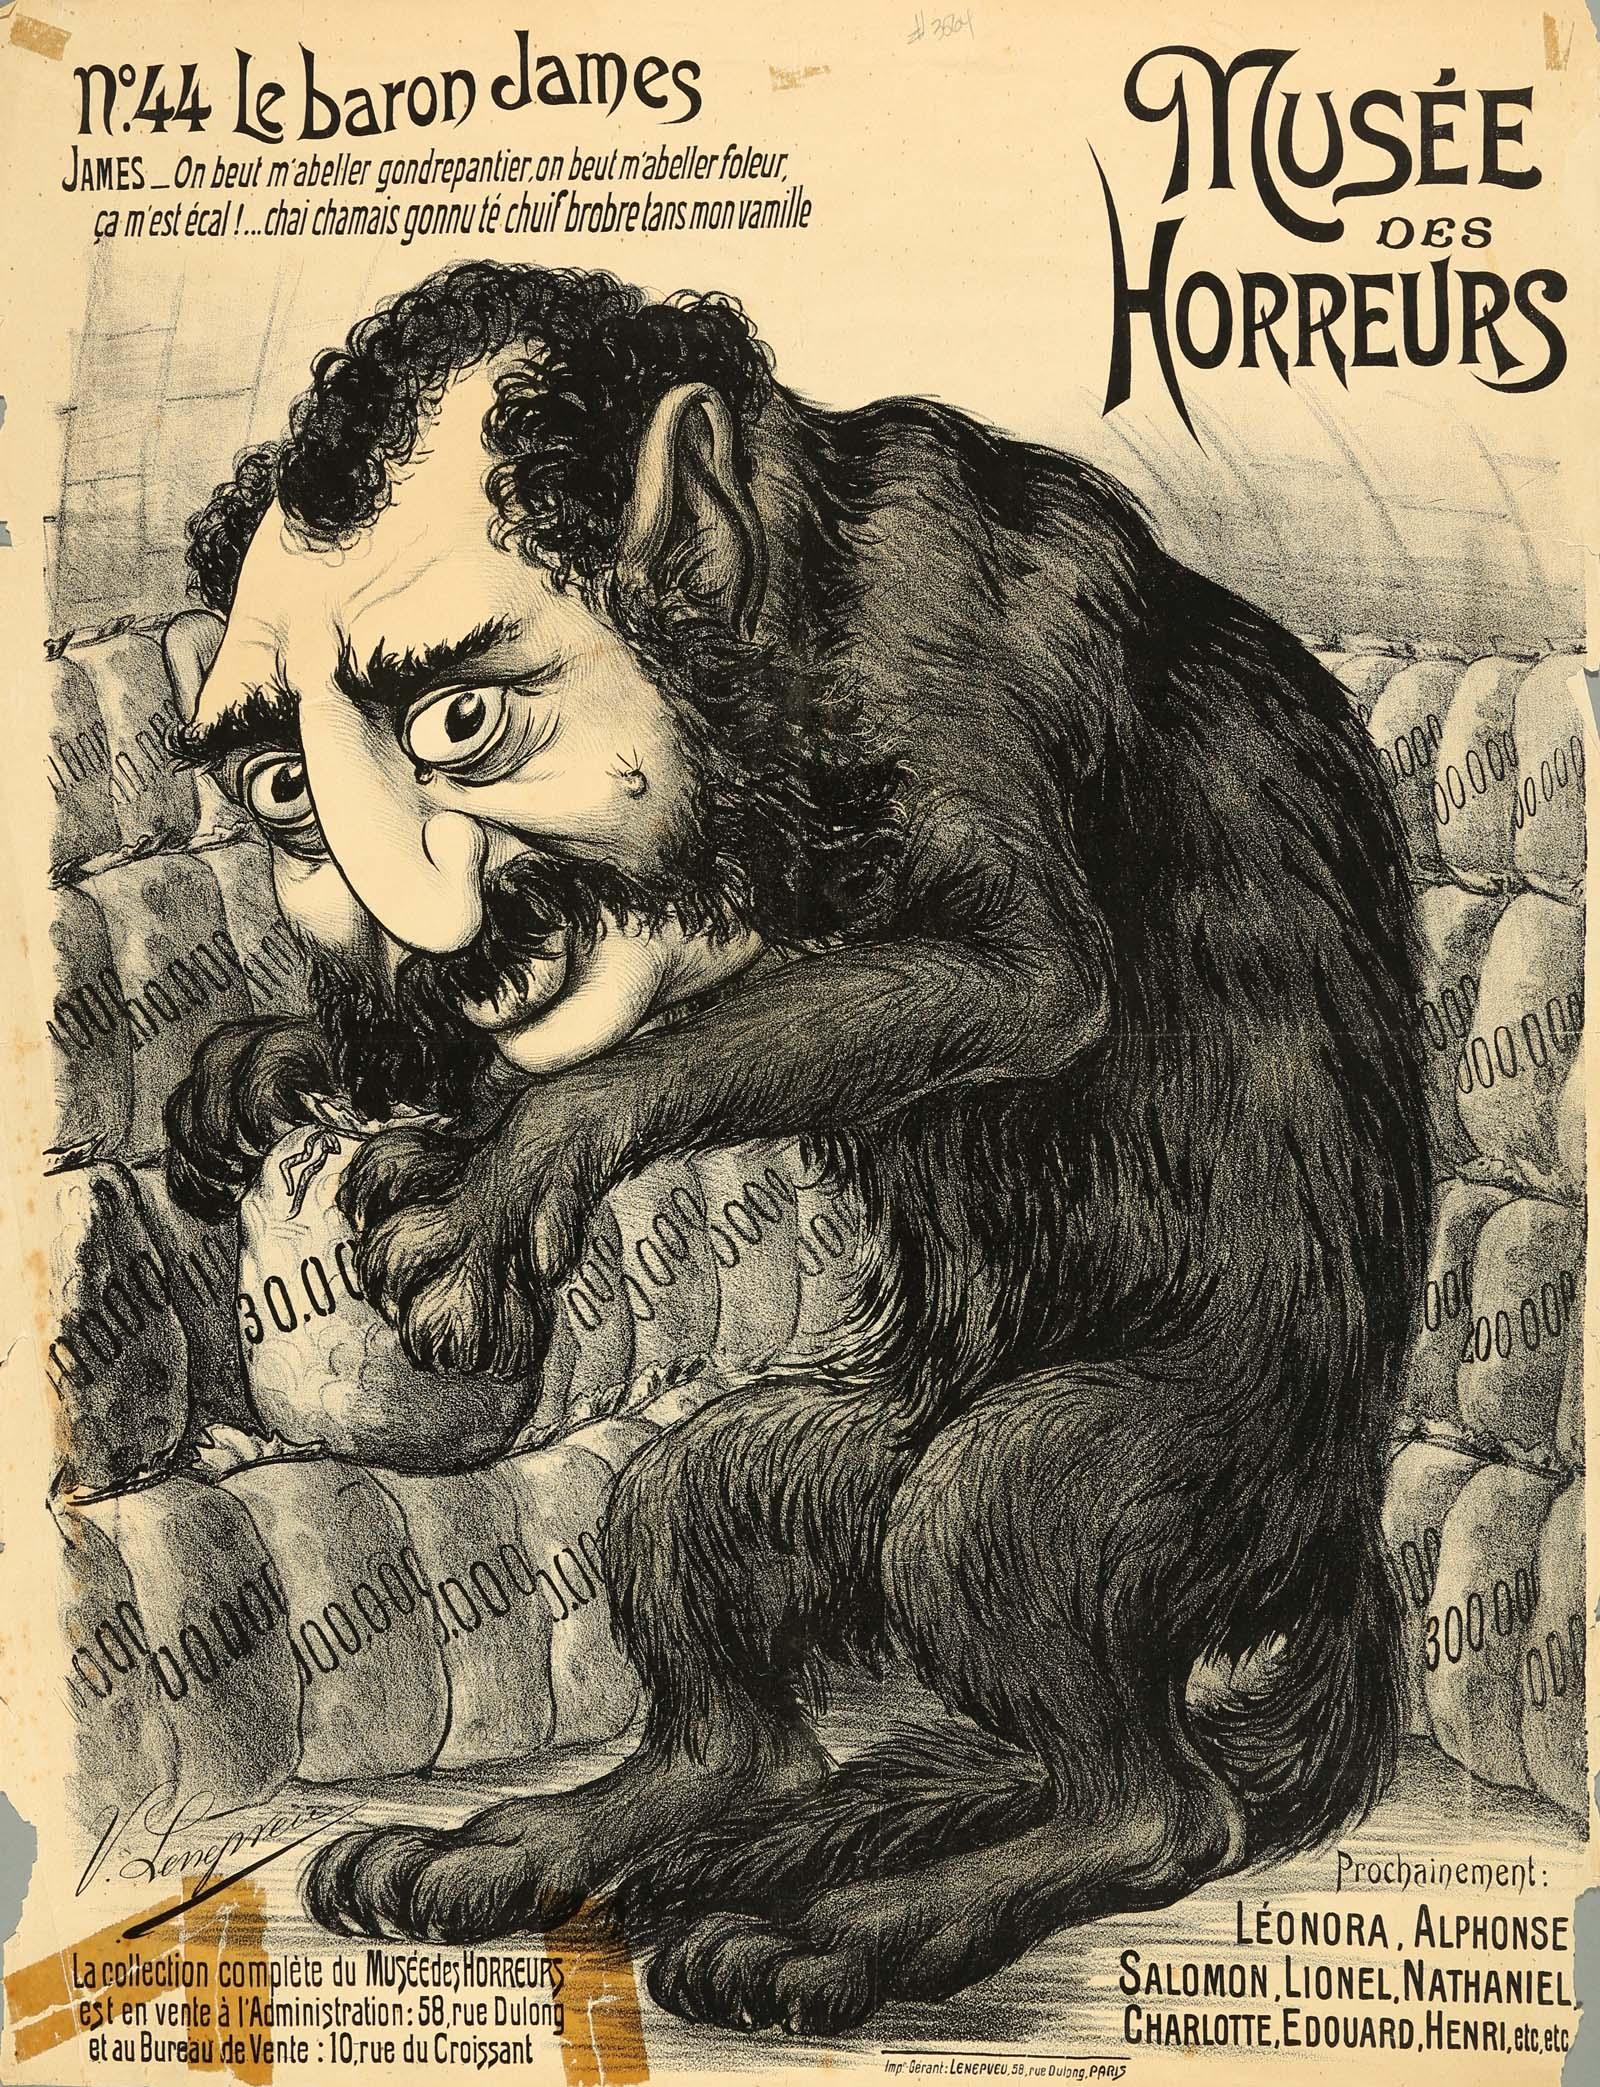 a cartoon of a monekt like figure with a human head counting money